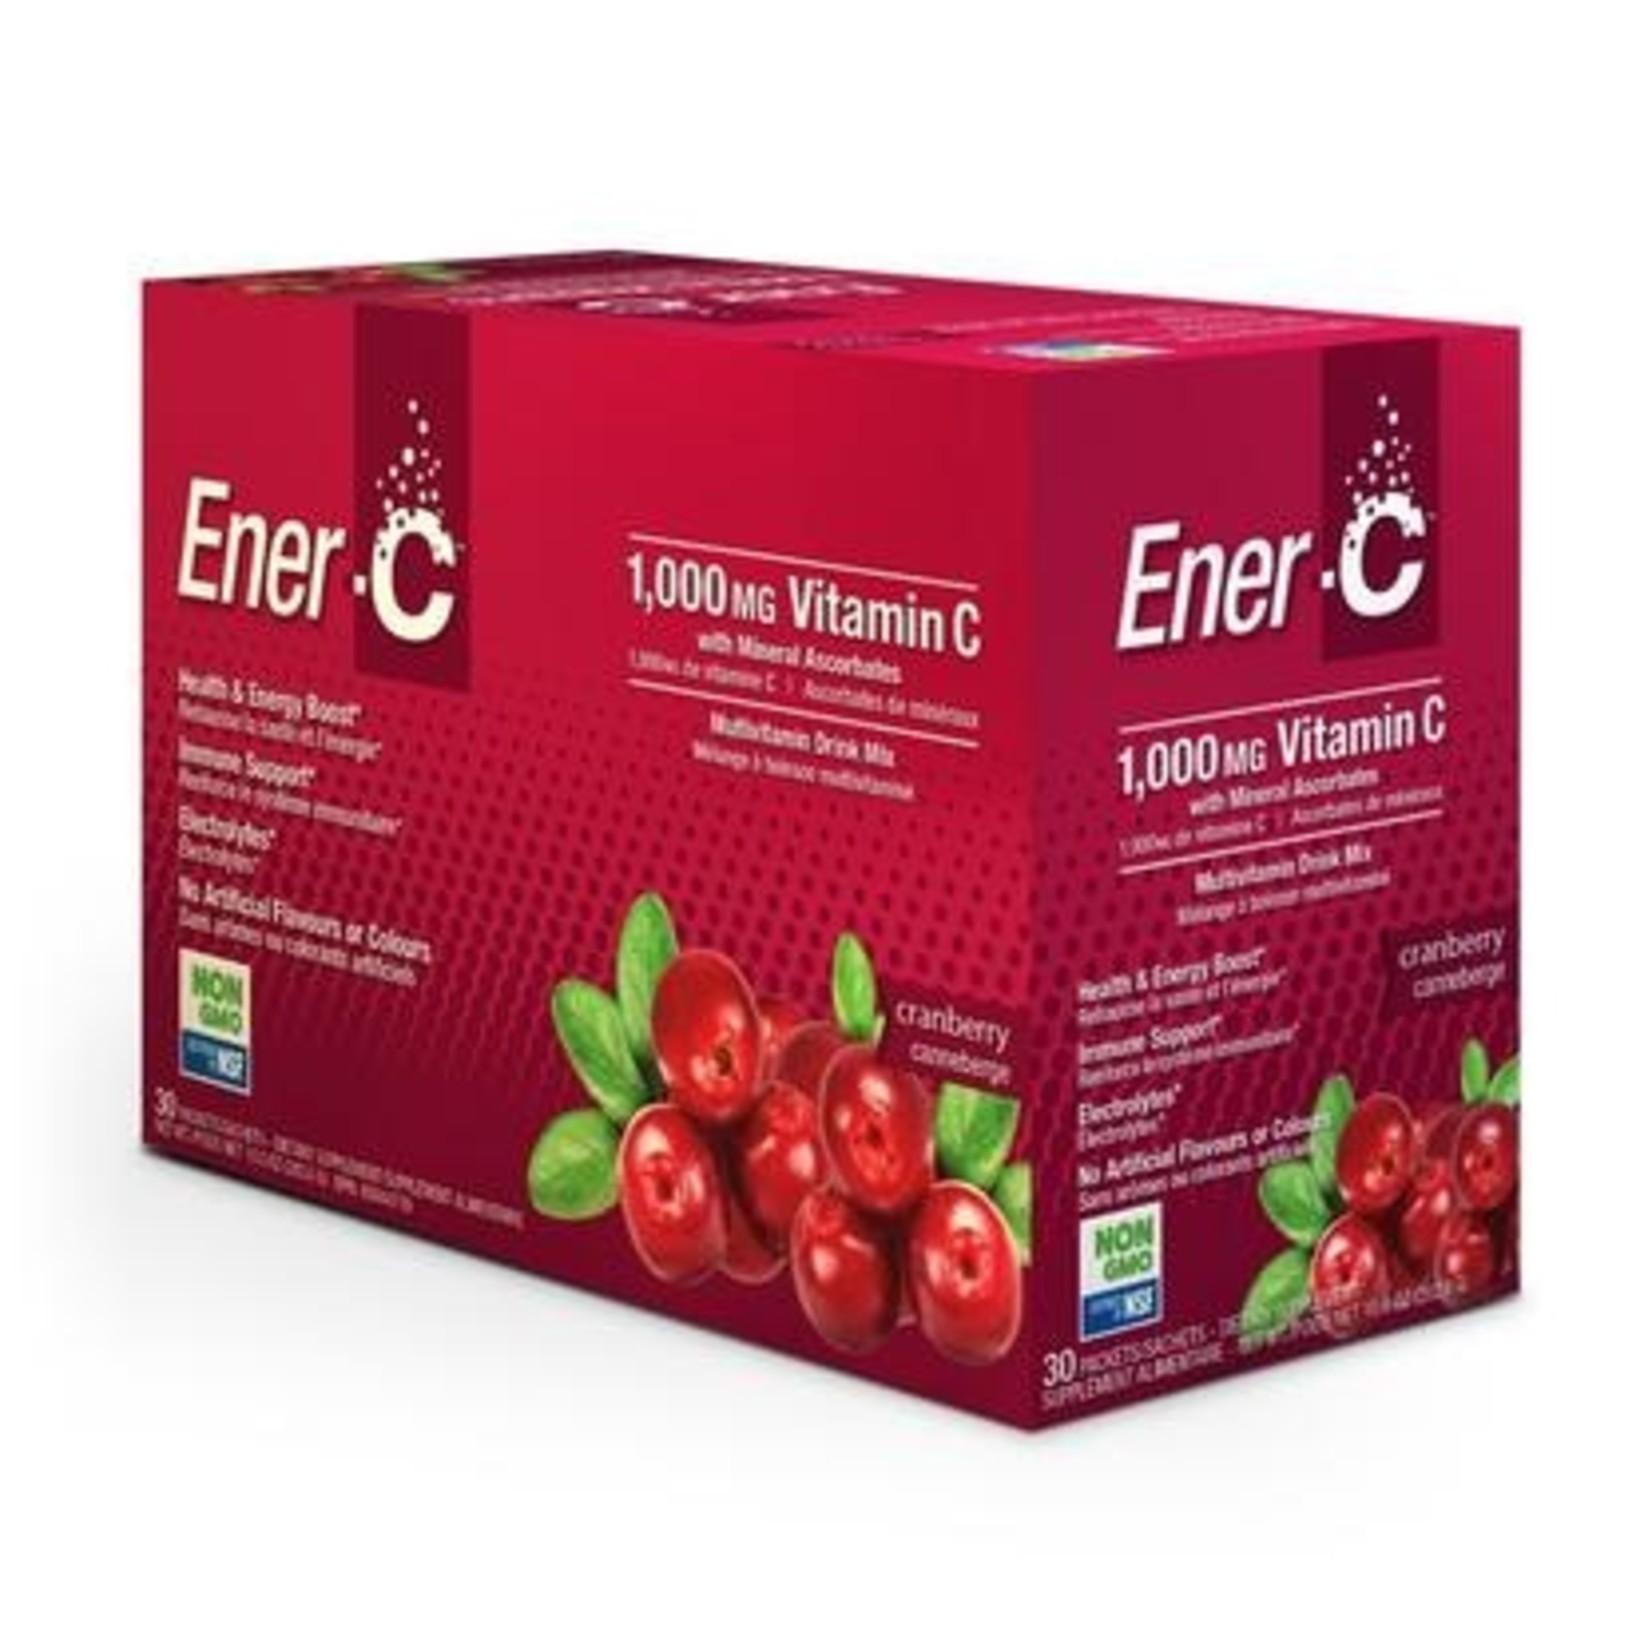 Ener-C Ener-C Vitamin C 1000mg- Cranberry 30 packets